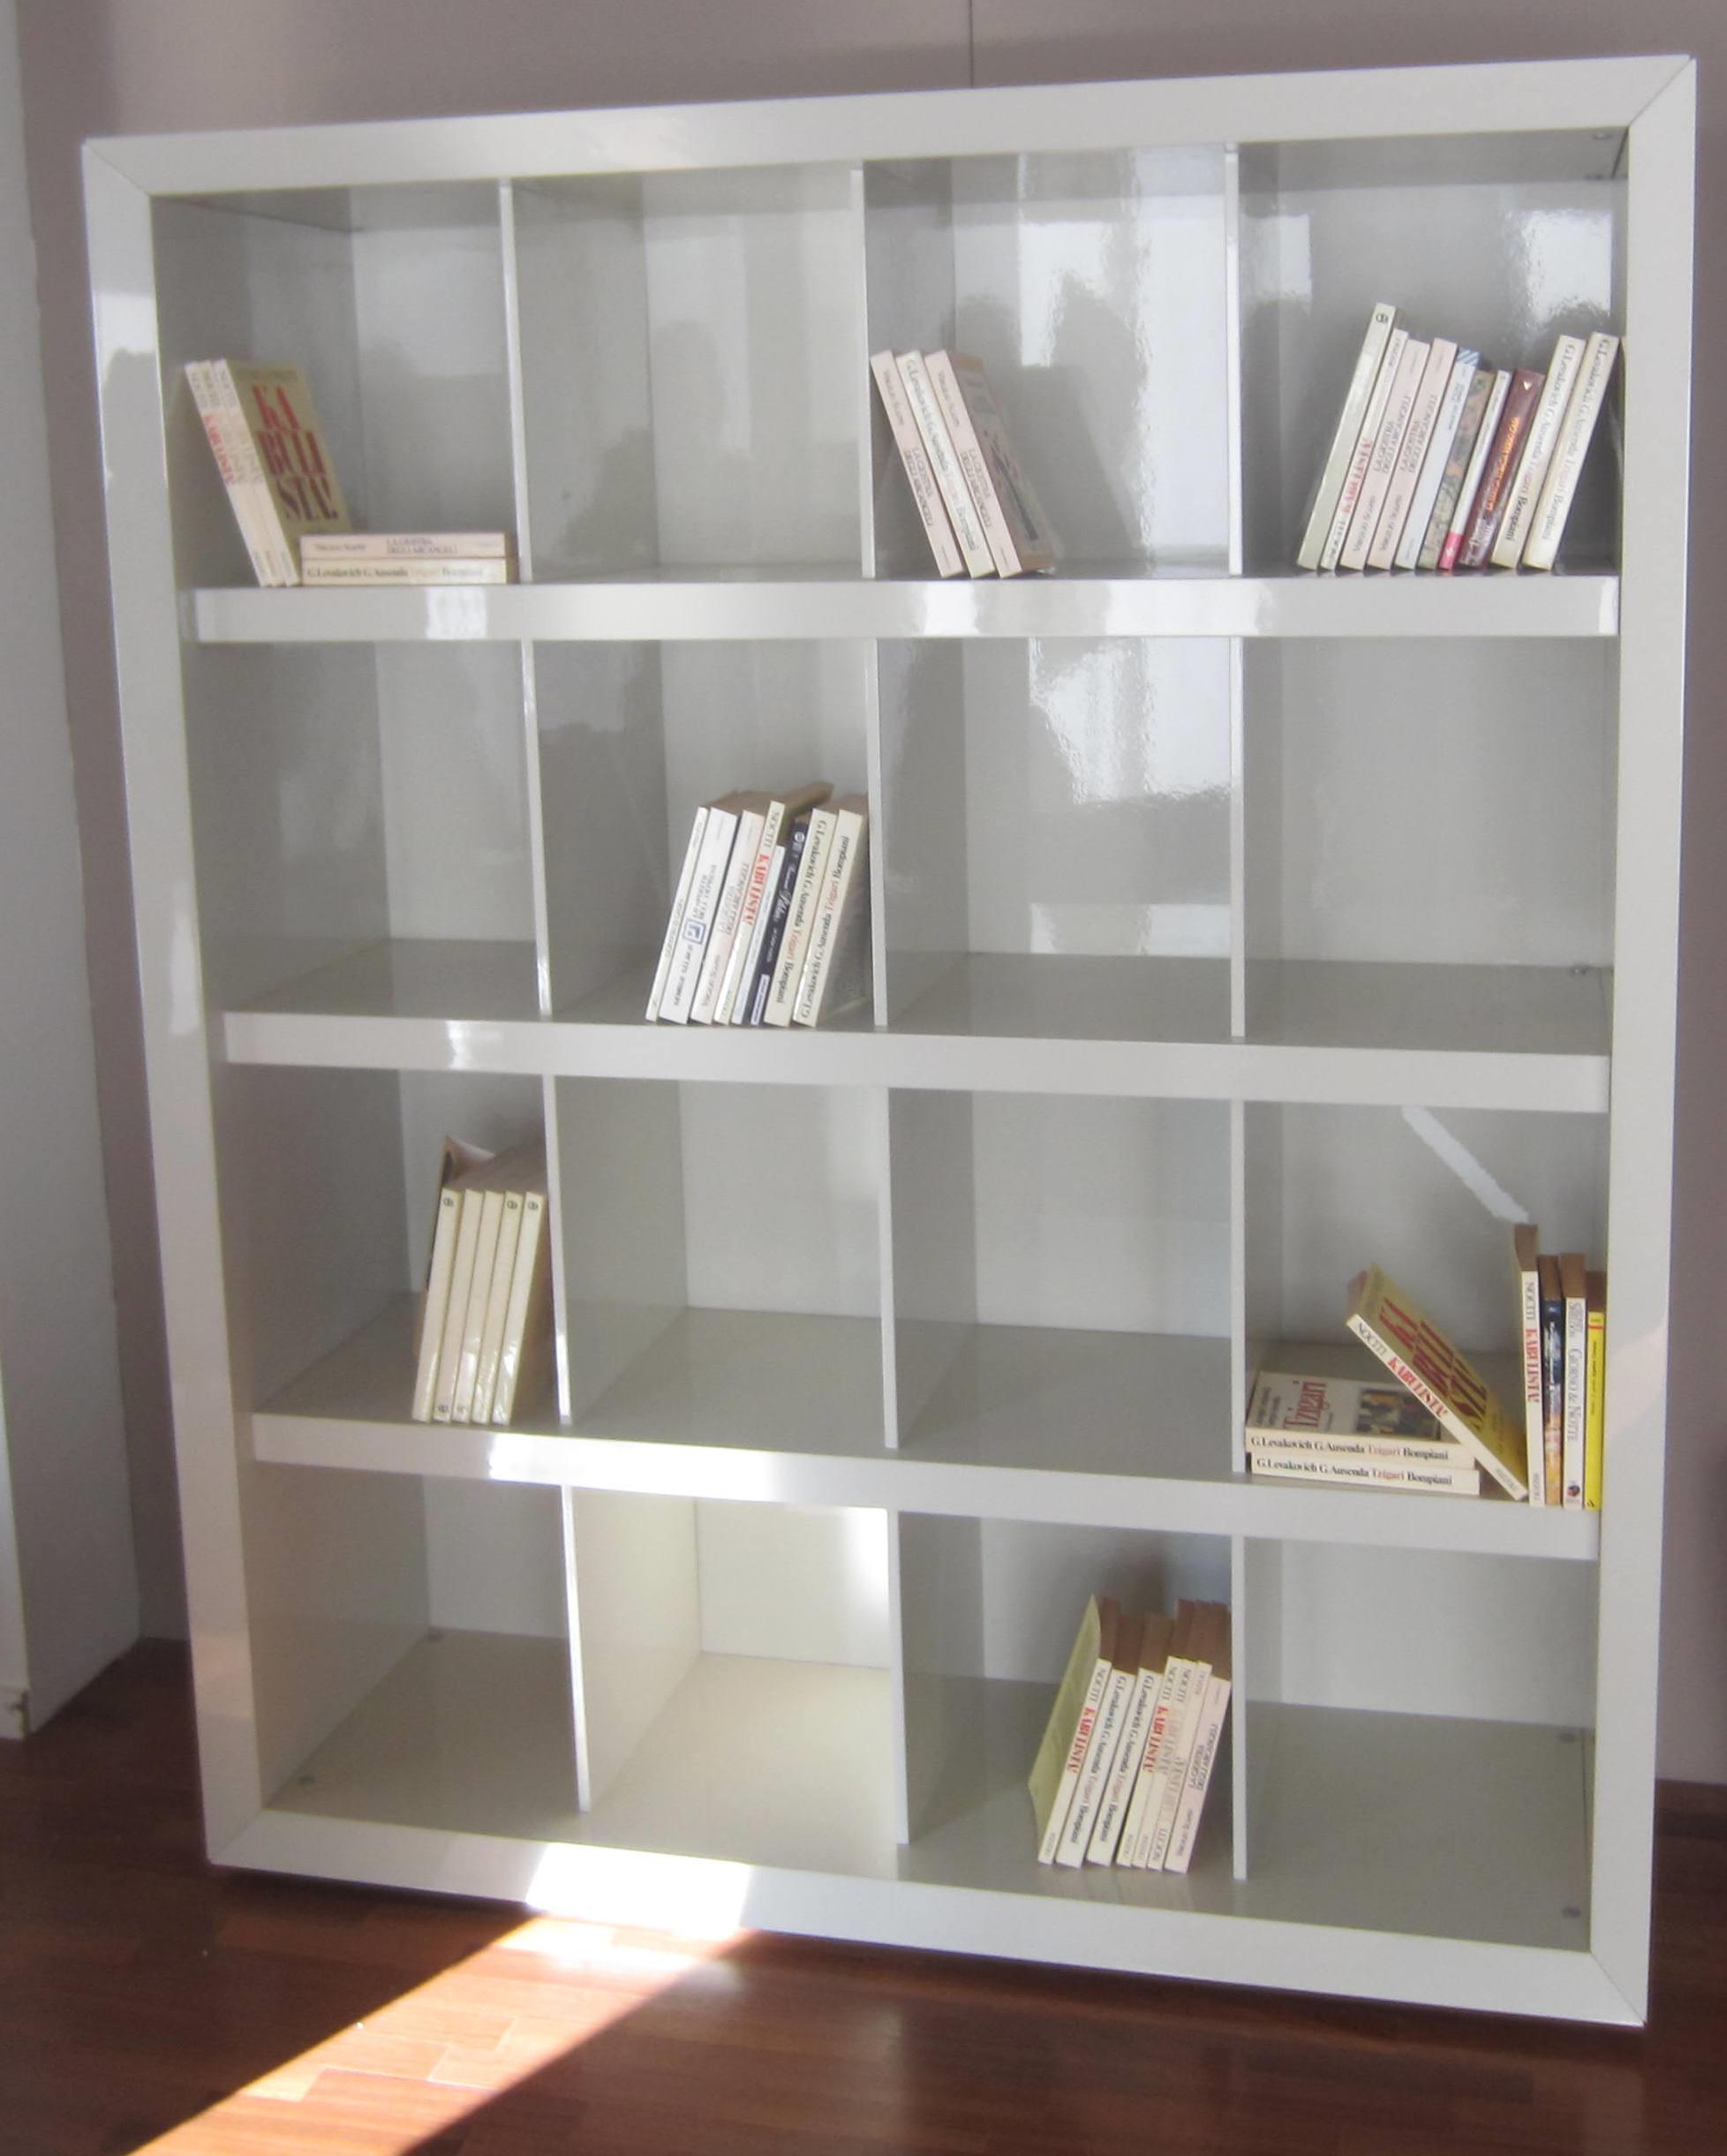 Librerie In Offerta Gallery - Ameripest.us - ameripest.us